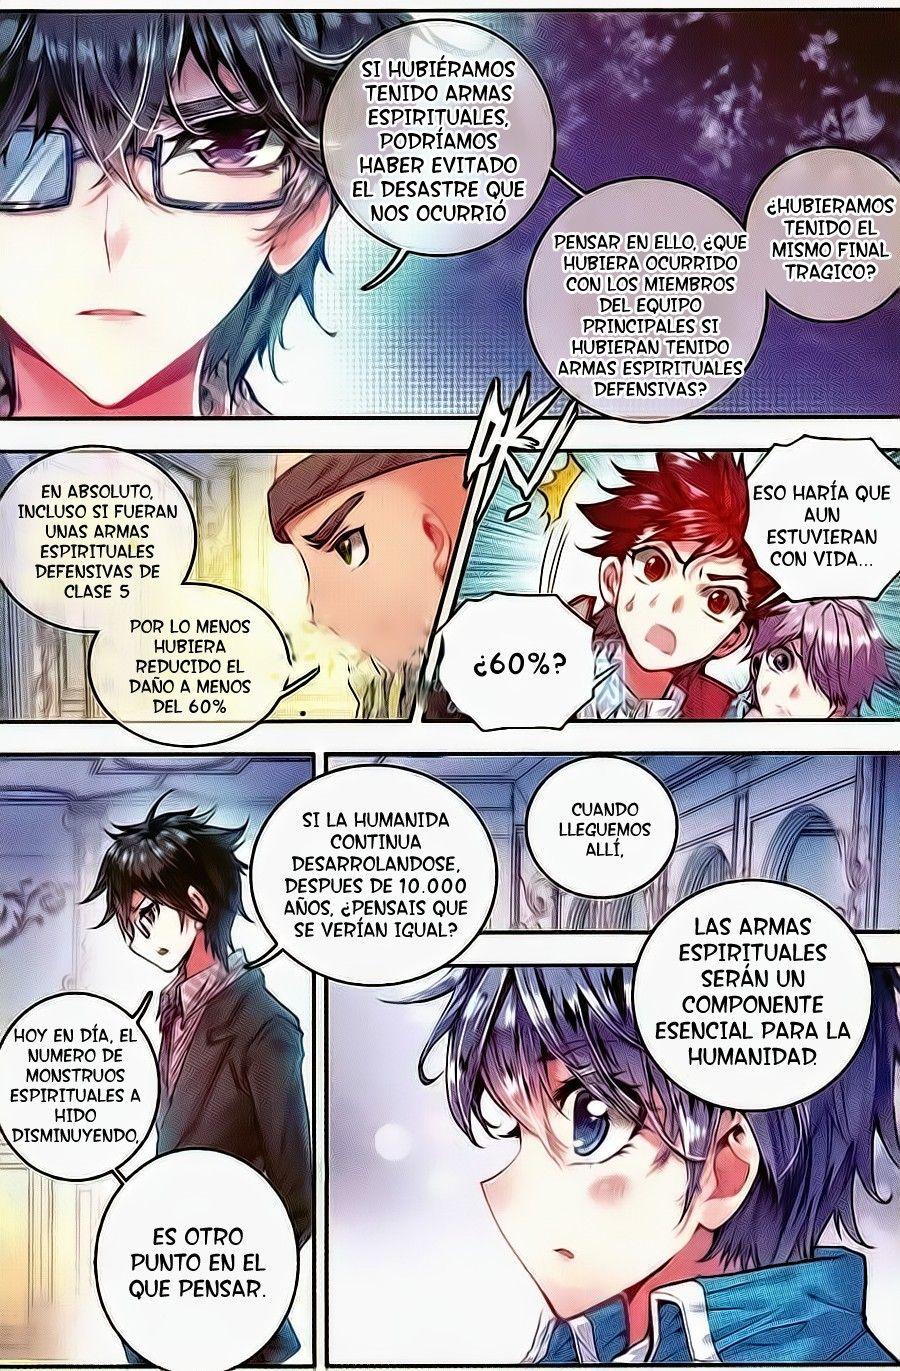 http://c5.ninemanga.com/es_manga/33/16417/453758/ba085ba9ace538a0e831ccfffb1265e6.jpg Page 4